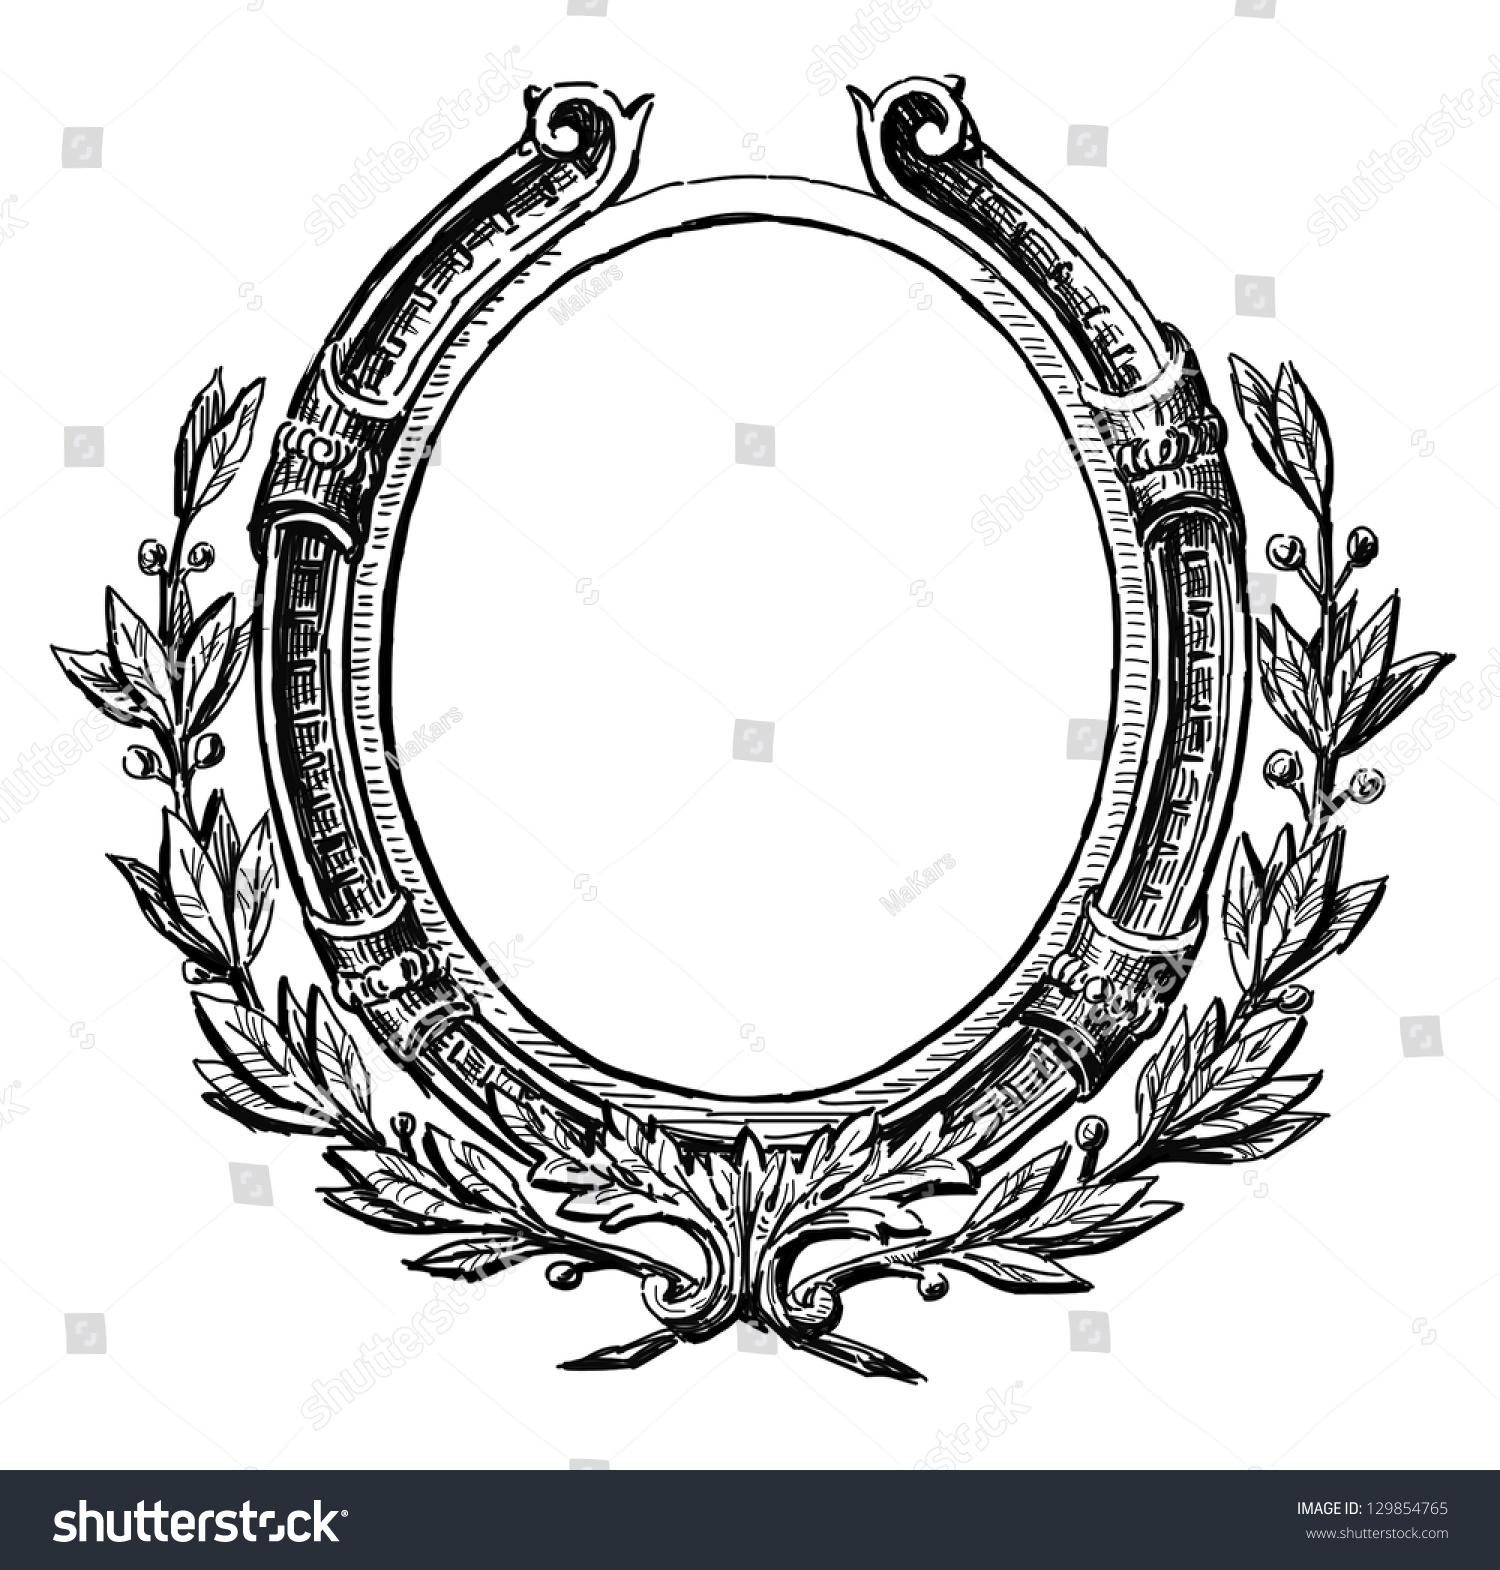 decorative round frame